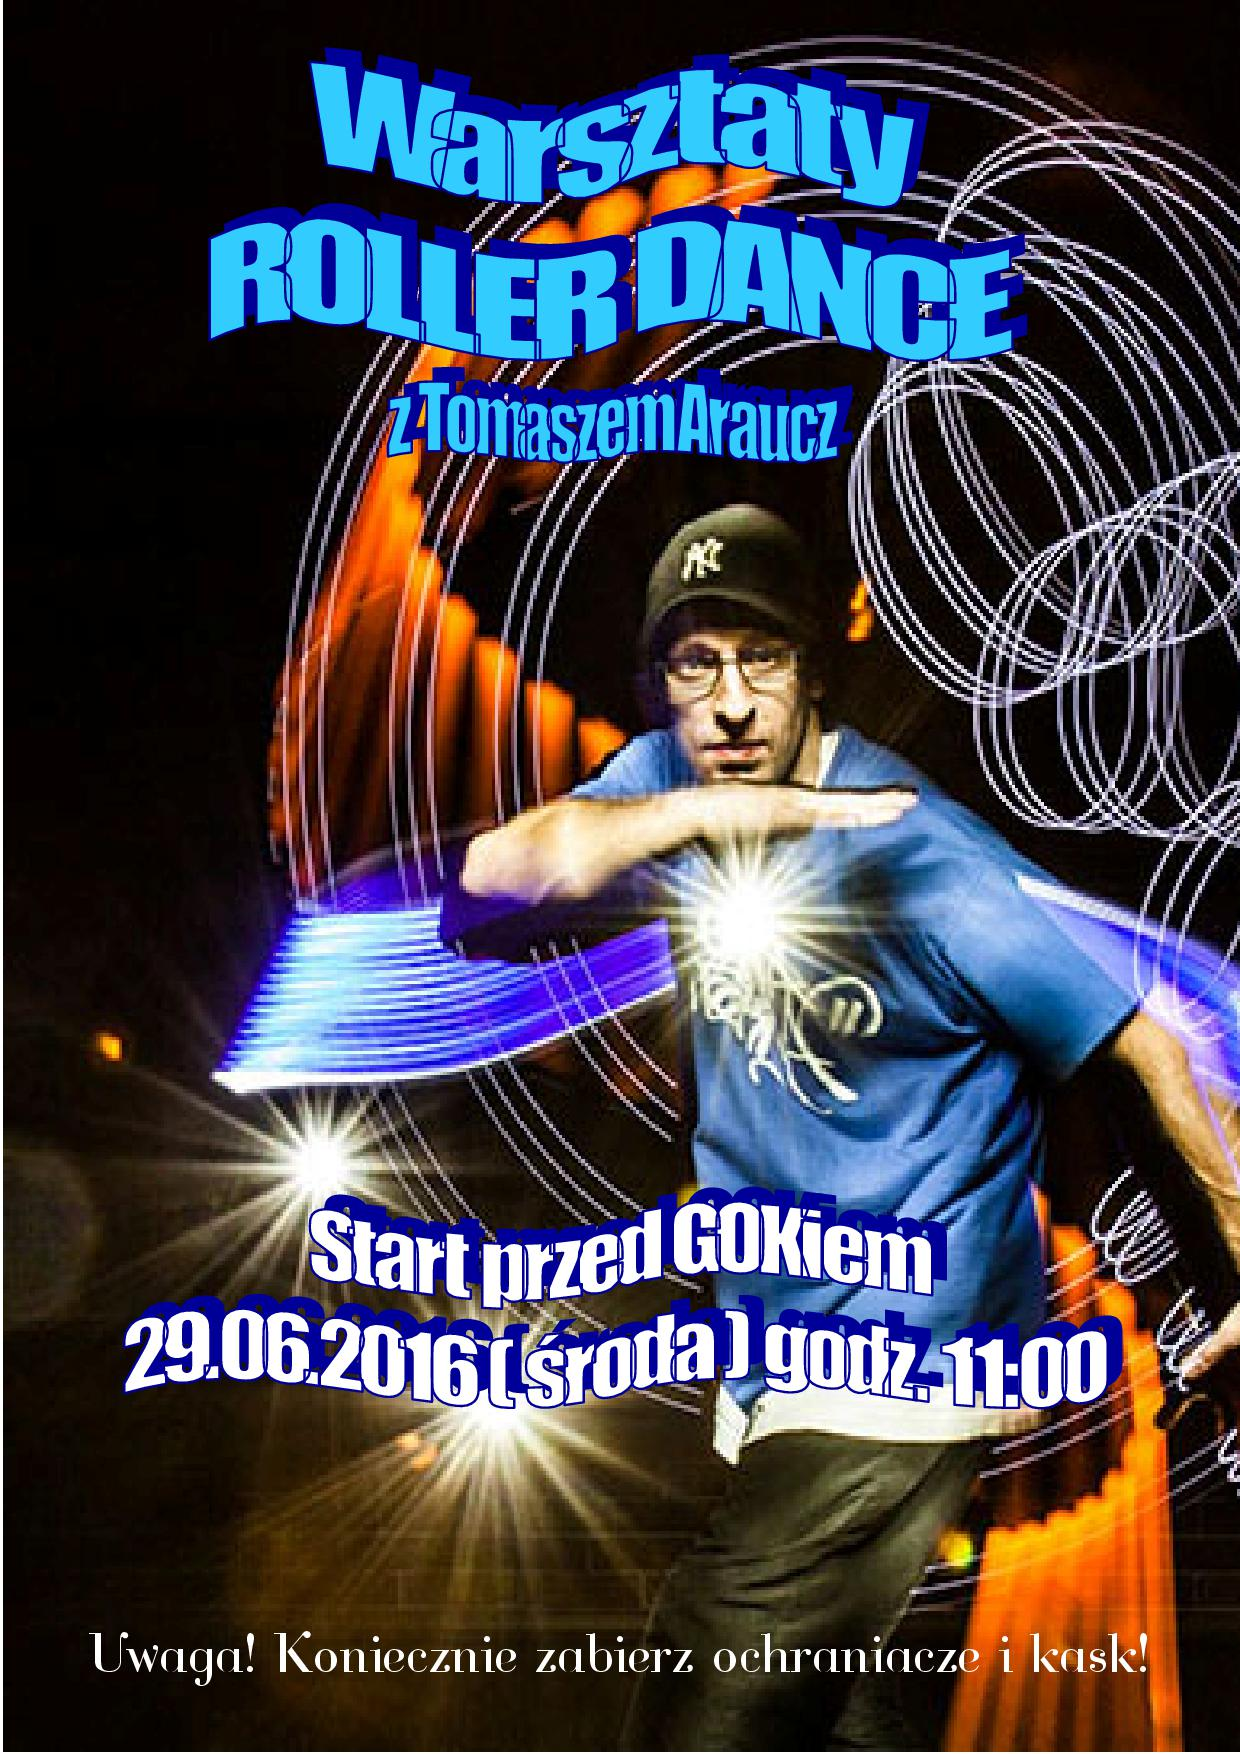 Roller Dance